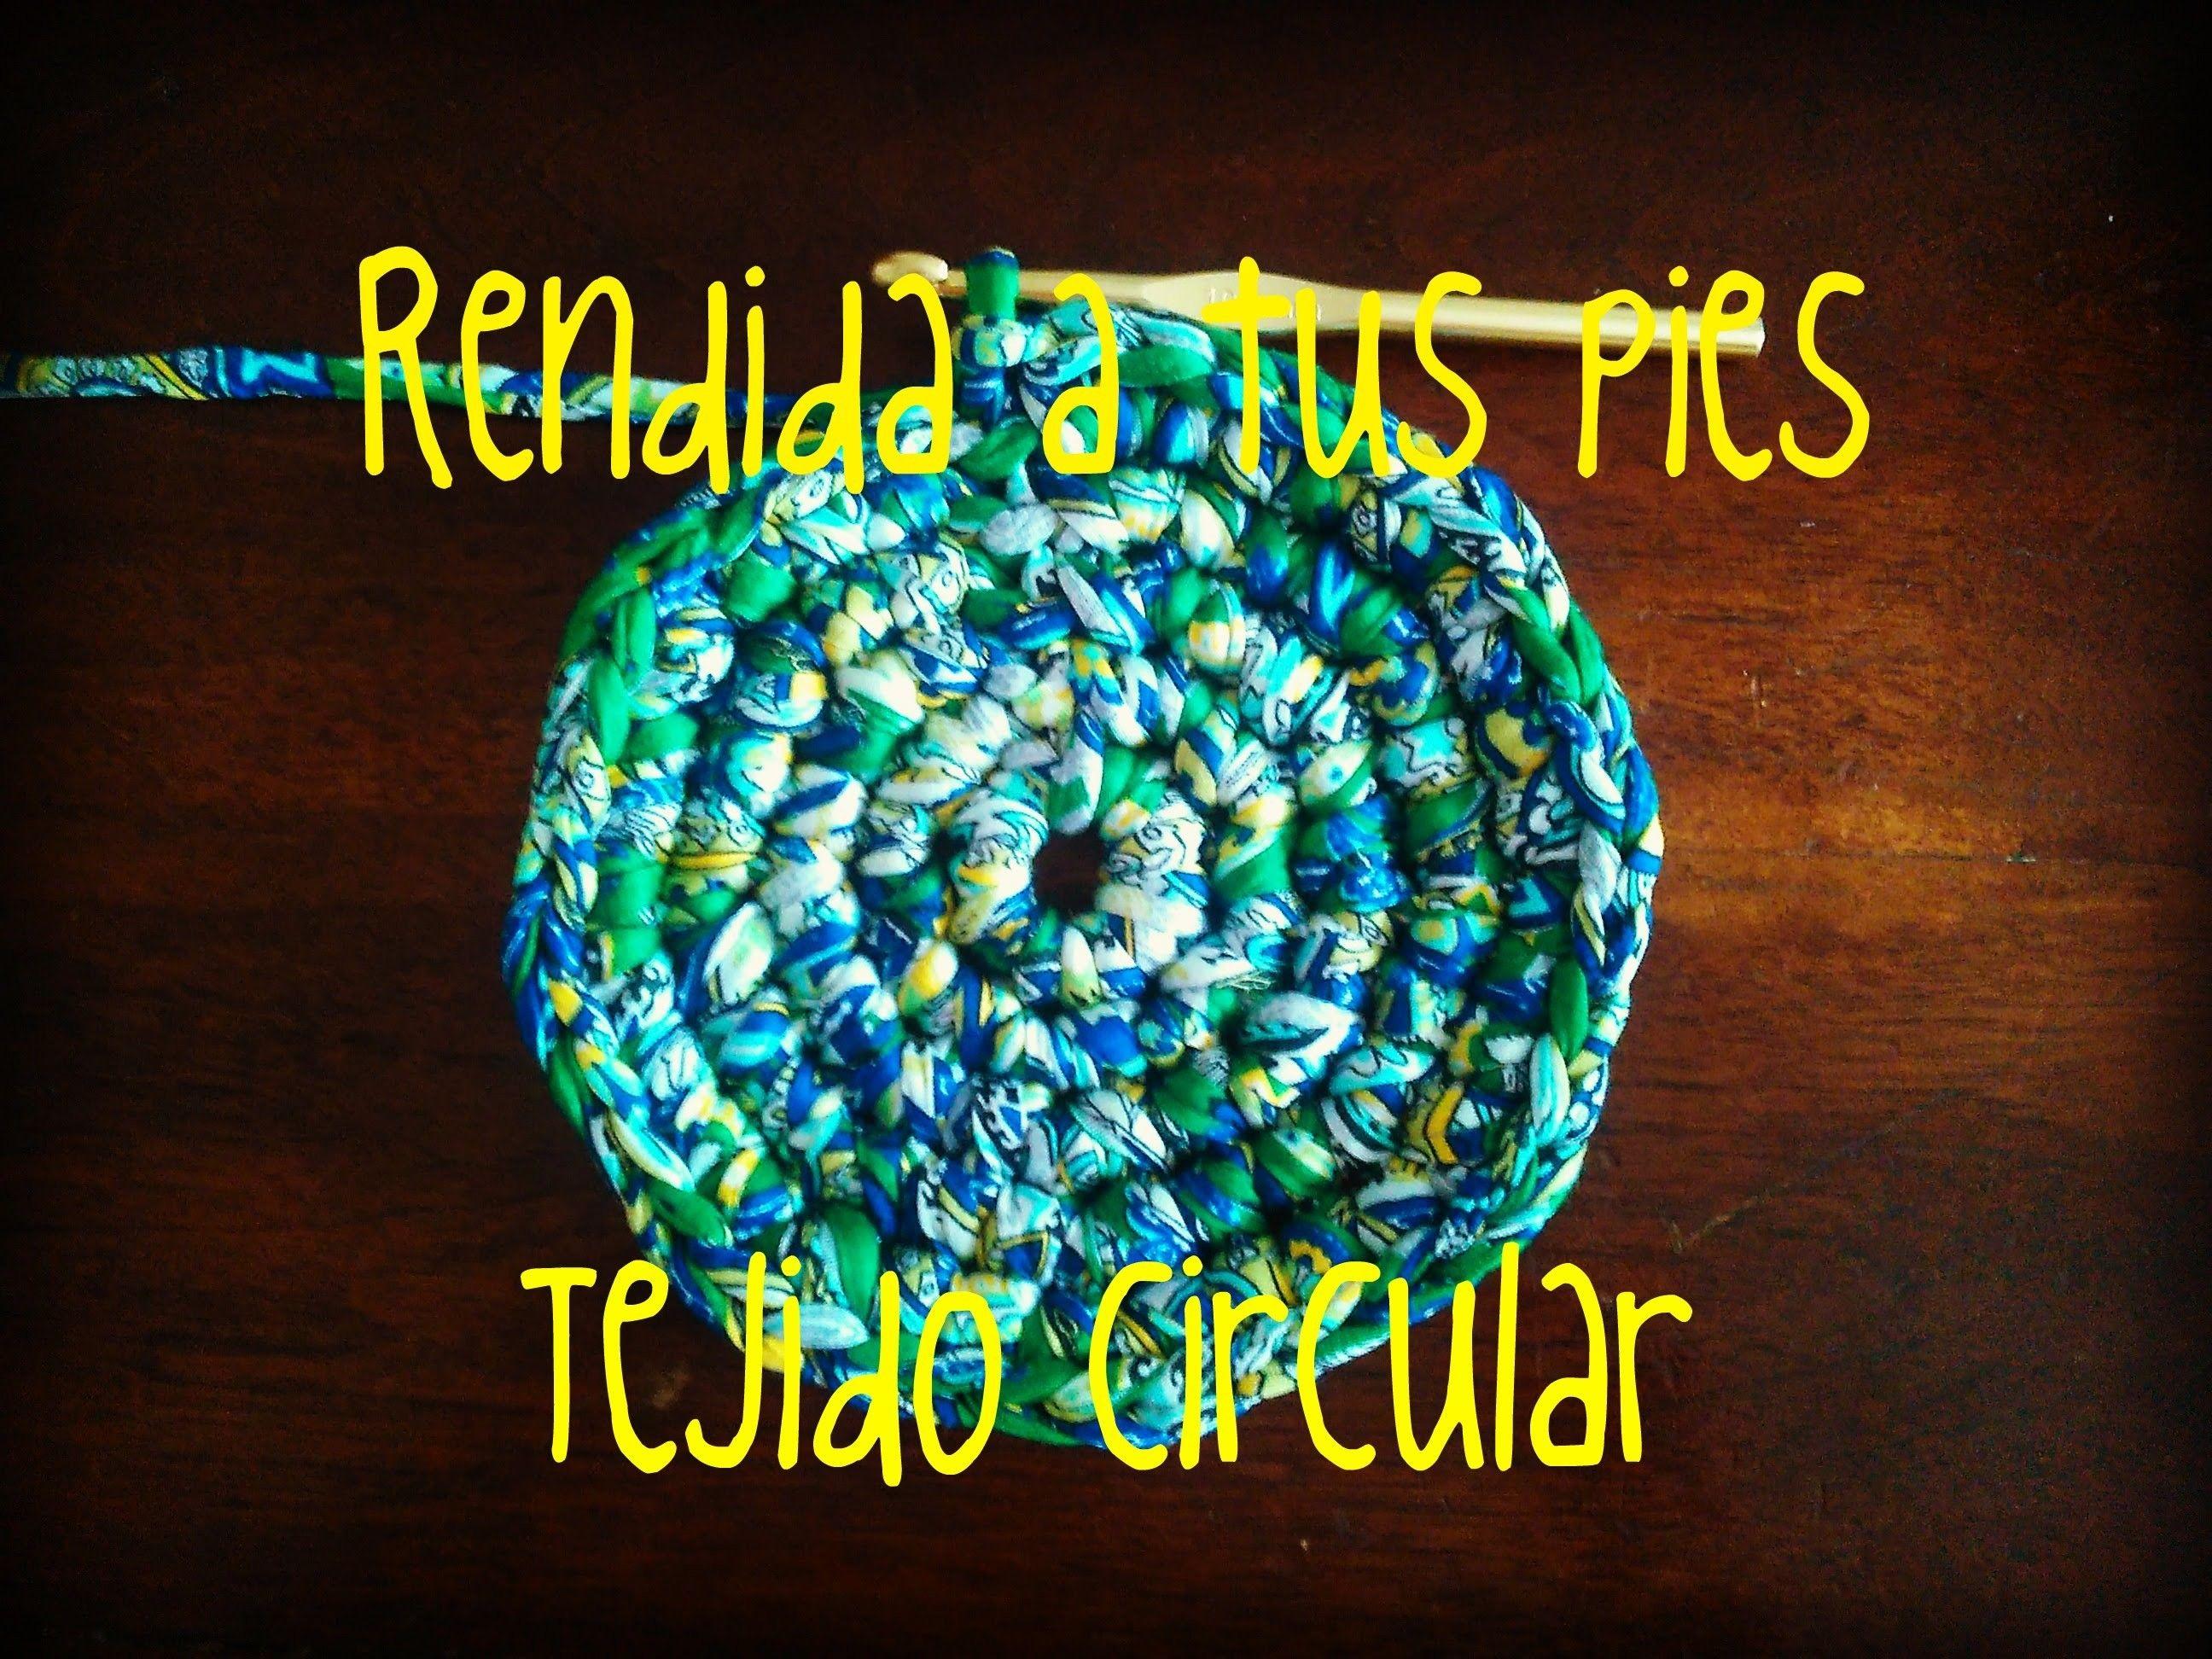 Tejido circular